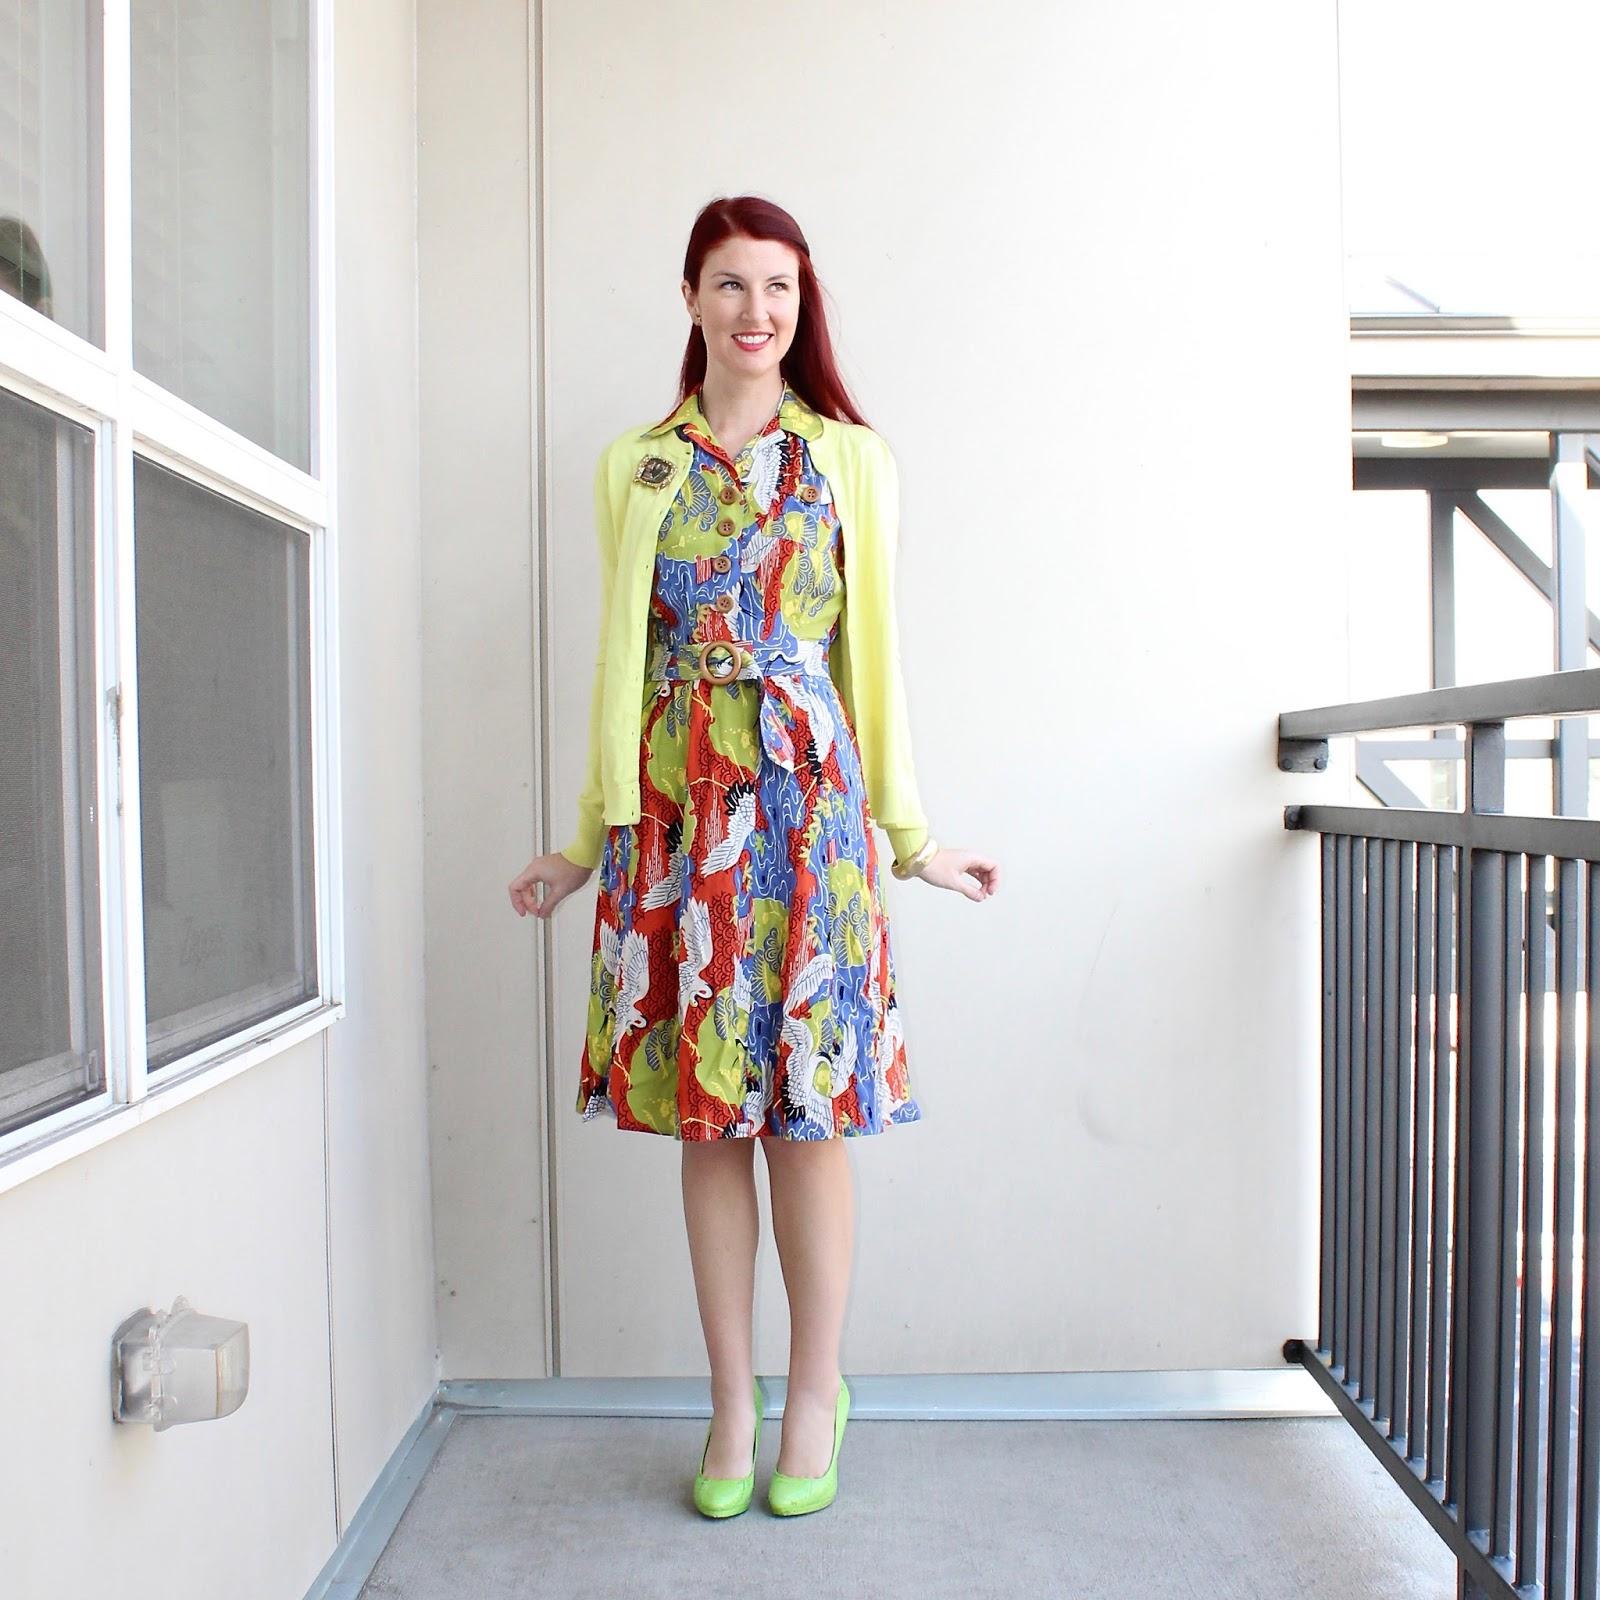 8d886470ed Trashy Diva Cranes Sweetie Dress Review